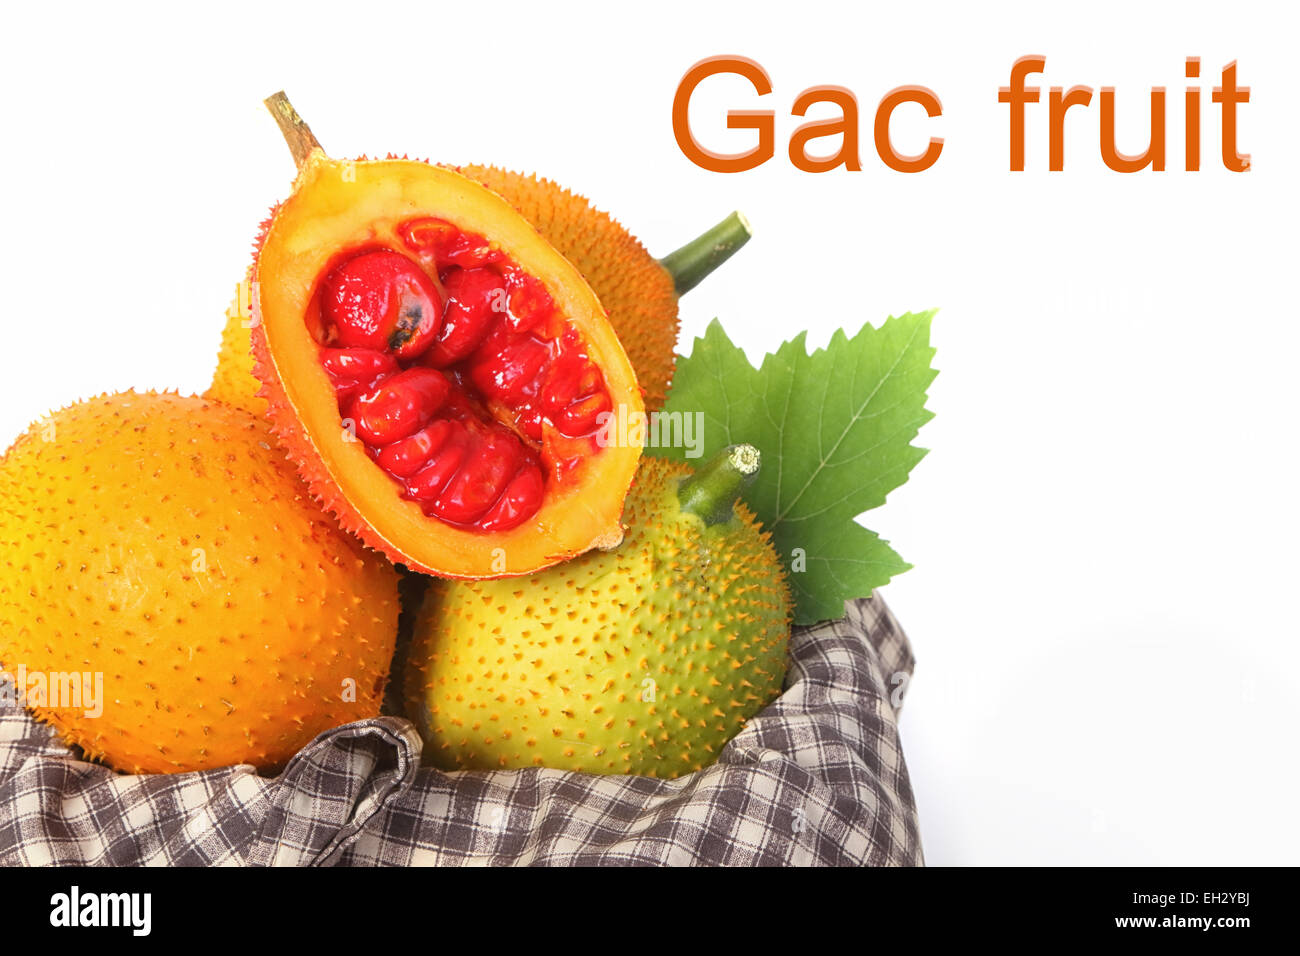 Gac fruit, Baby Jackfruit, Spiny Bitter Gourd in wooden crate - Stock Image